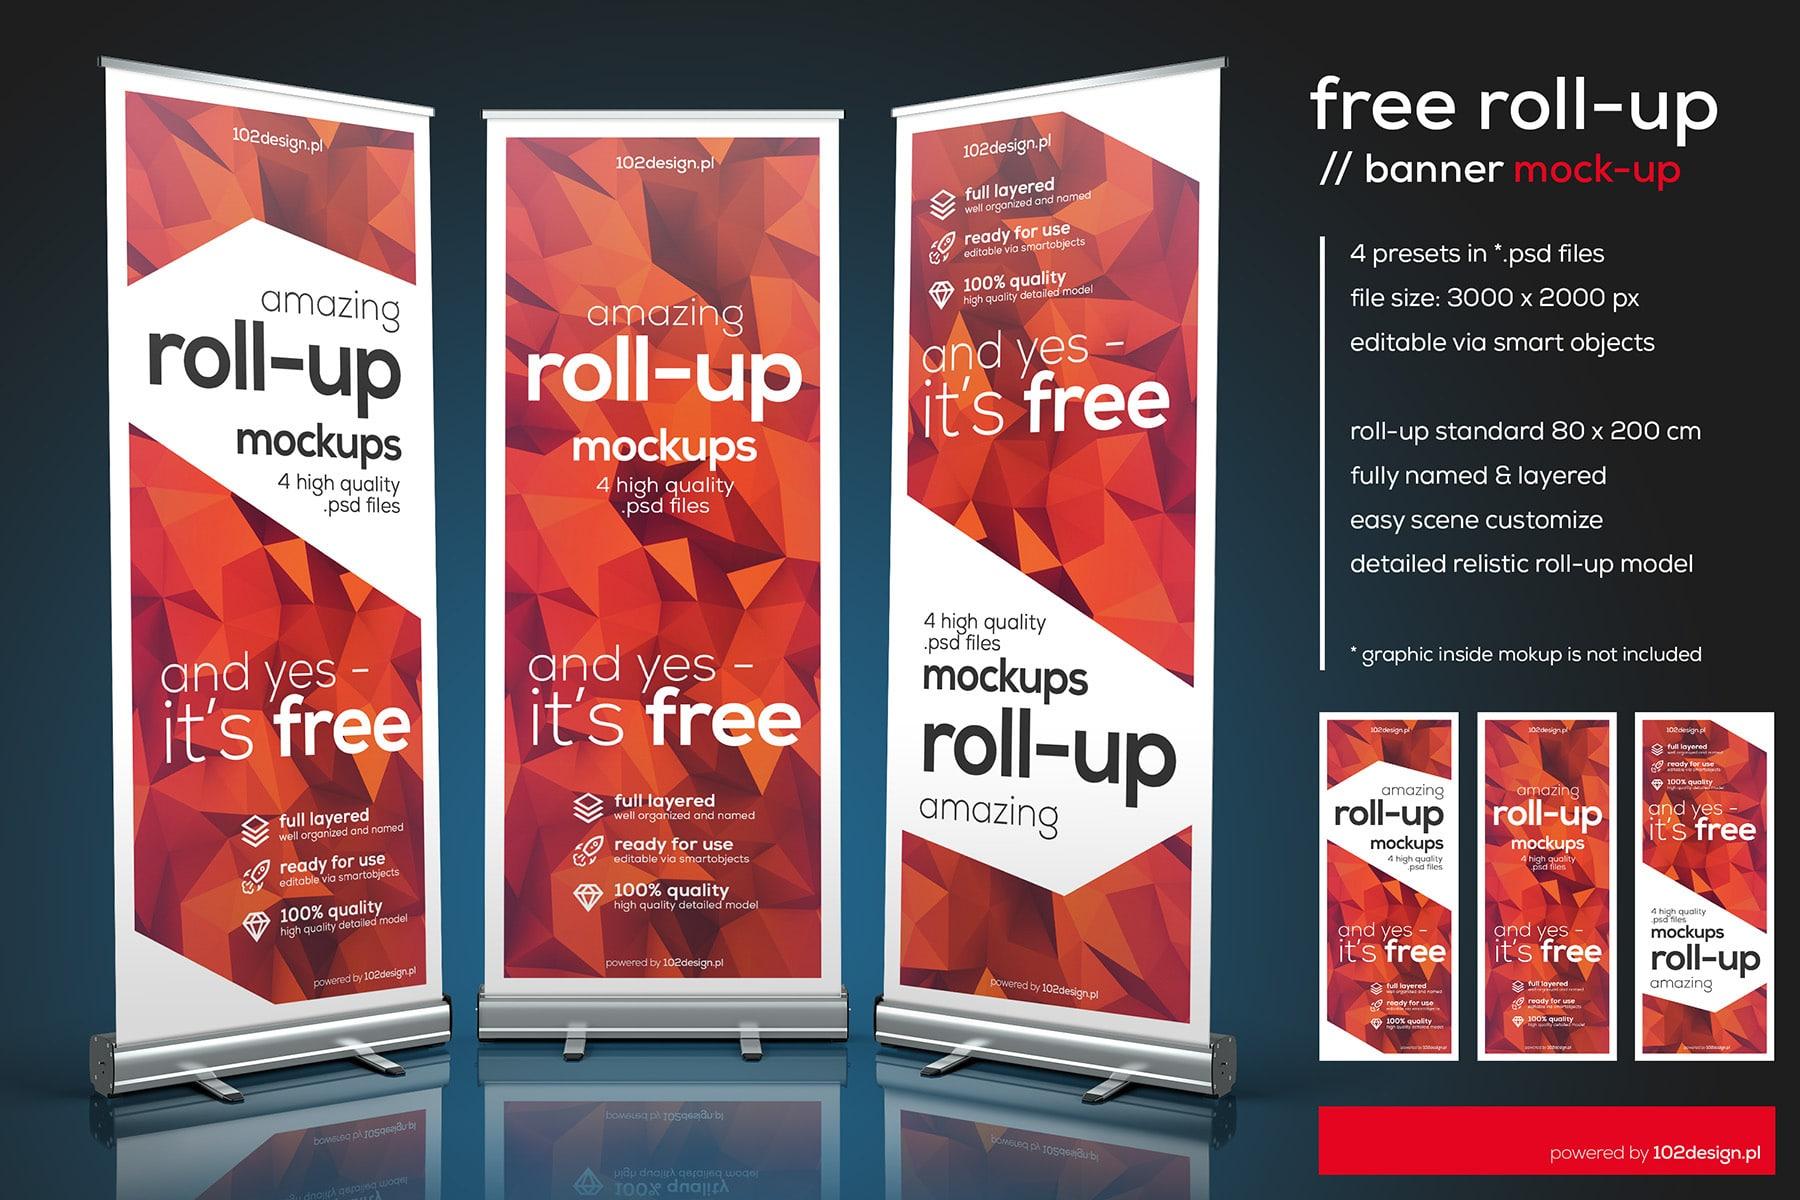 Customizable Roll-up Mockup